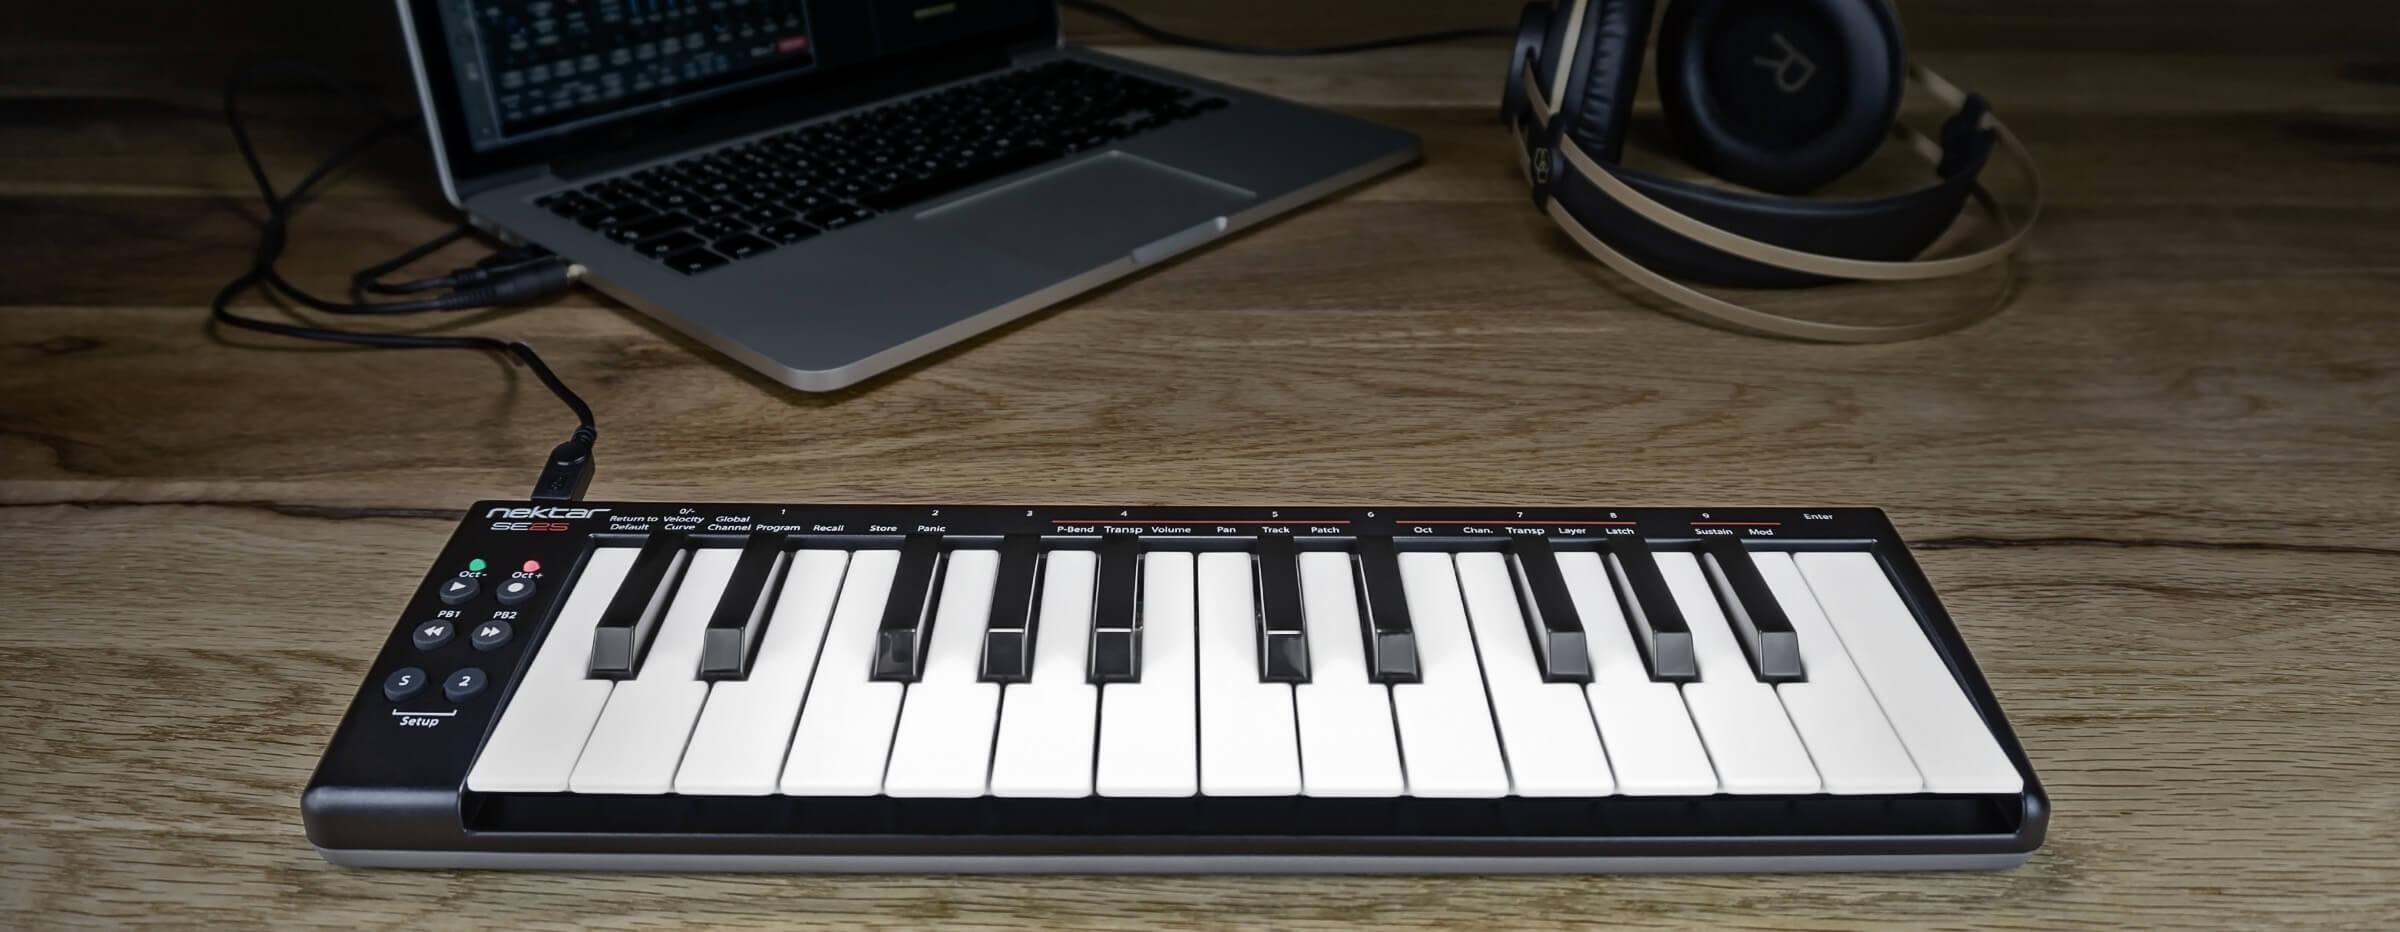 MIDI-клавиатура Nektar SE25